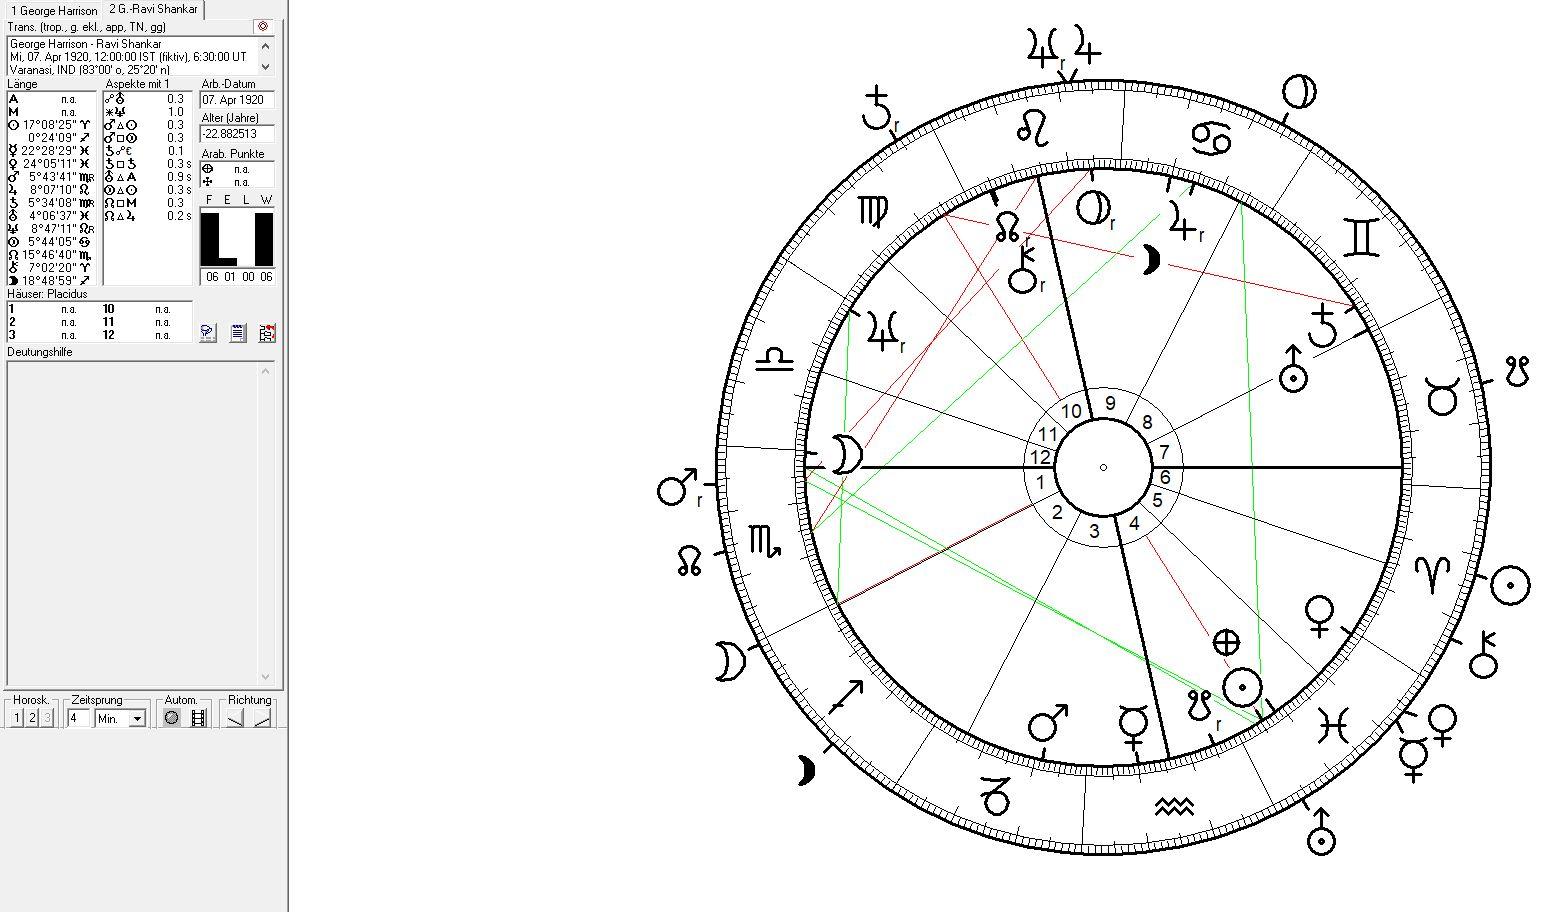 Ravi Shankar and George Harrison   Astrogeography Blog